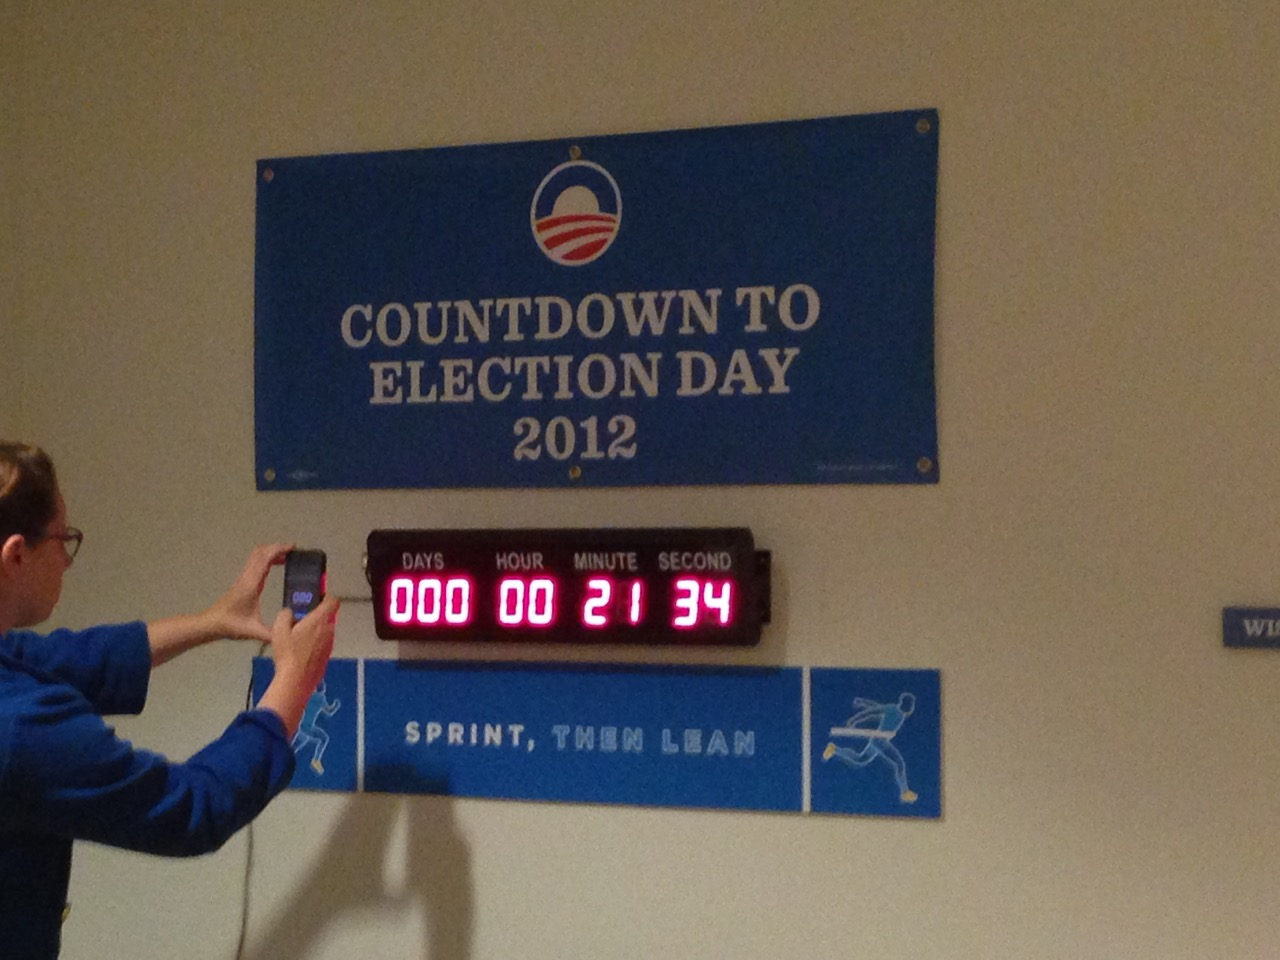 Election countdown clock